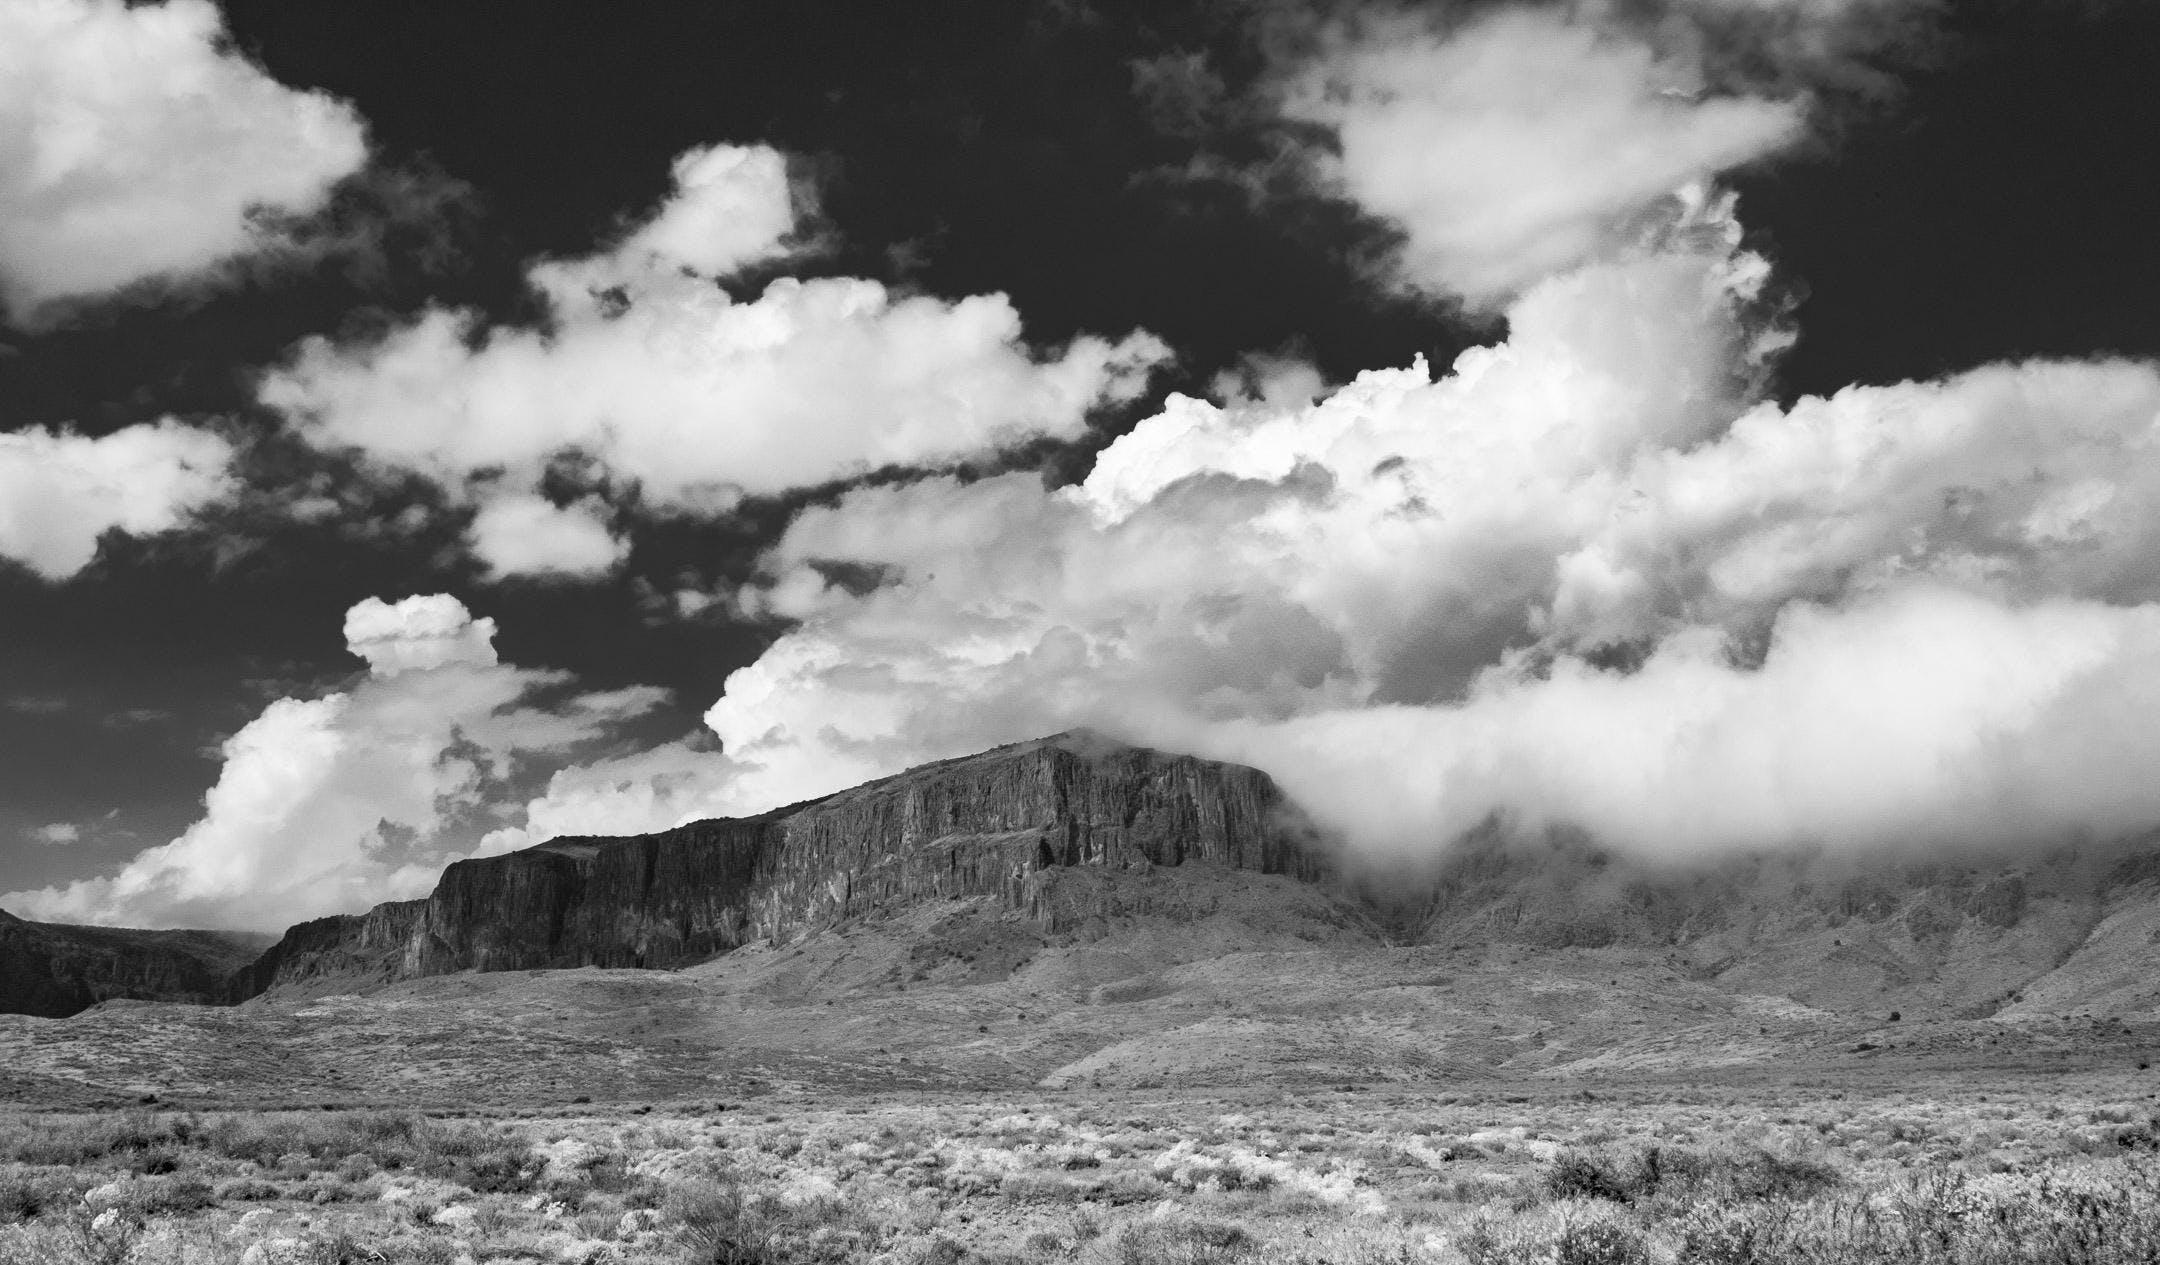 Improve Your Landscape Photography